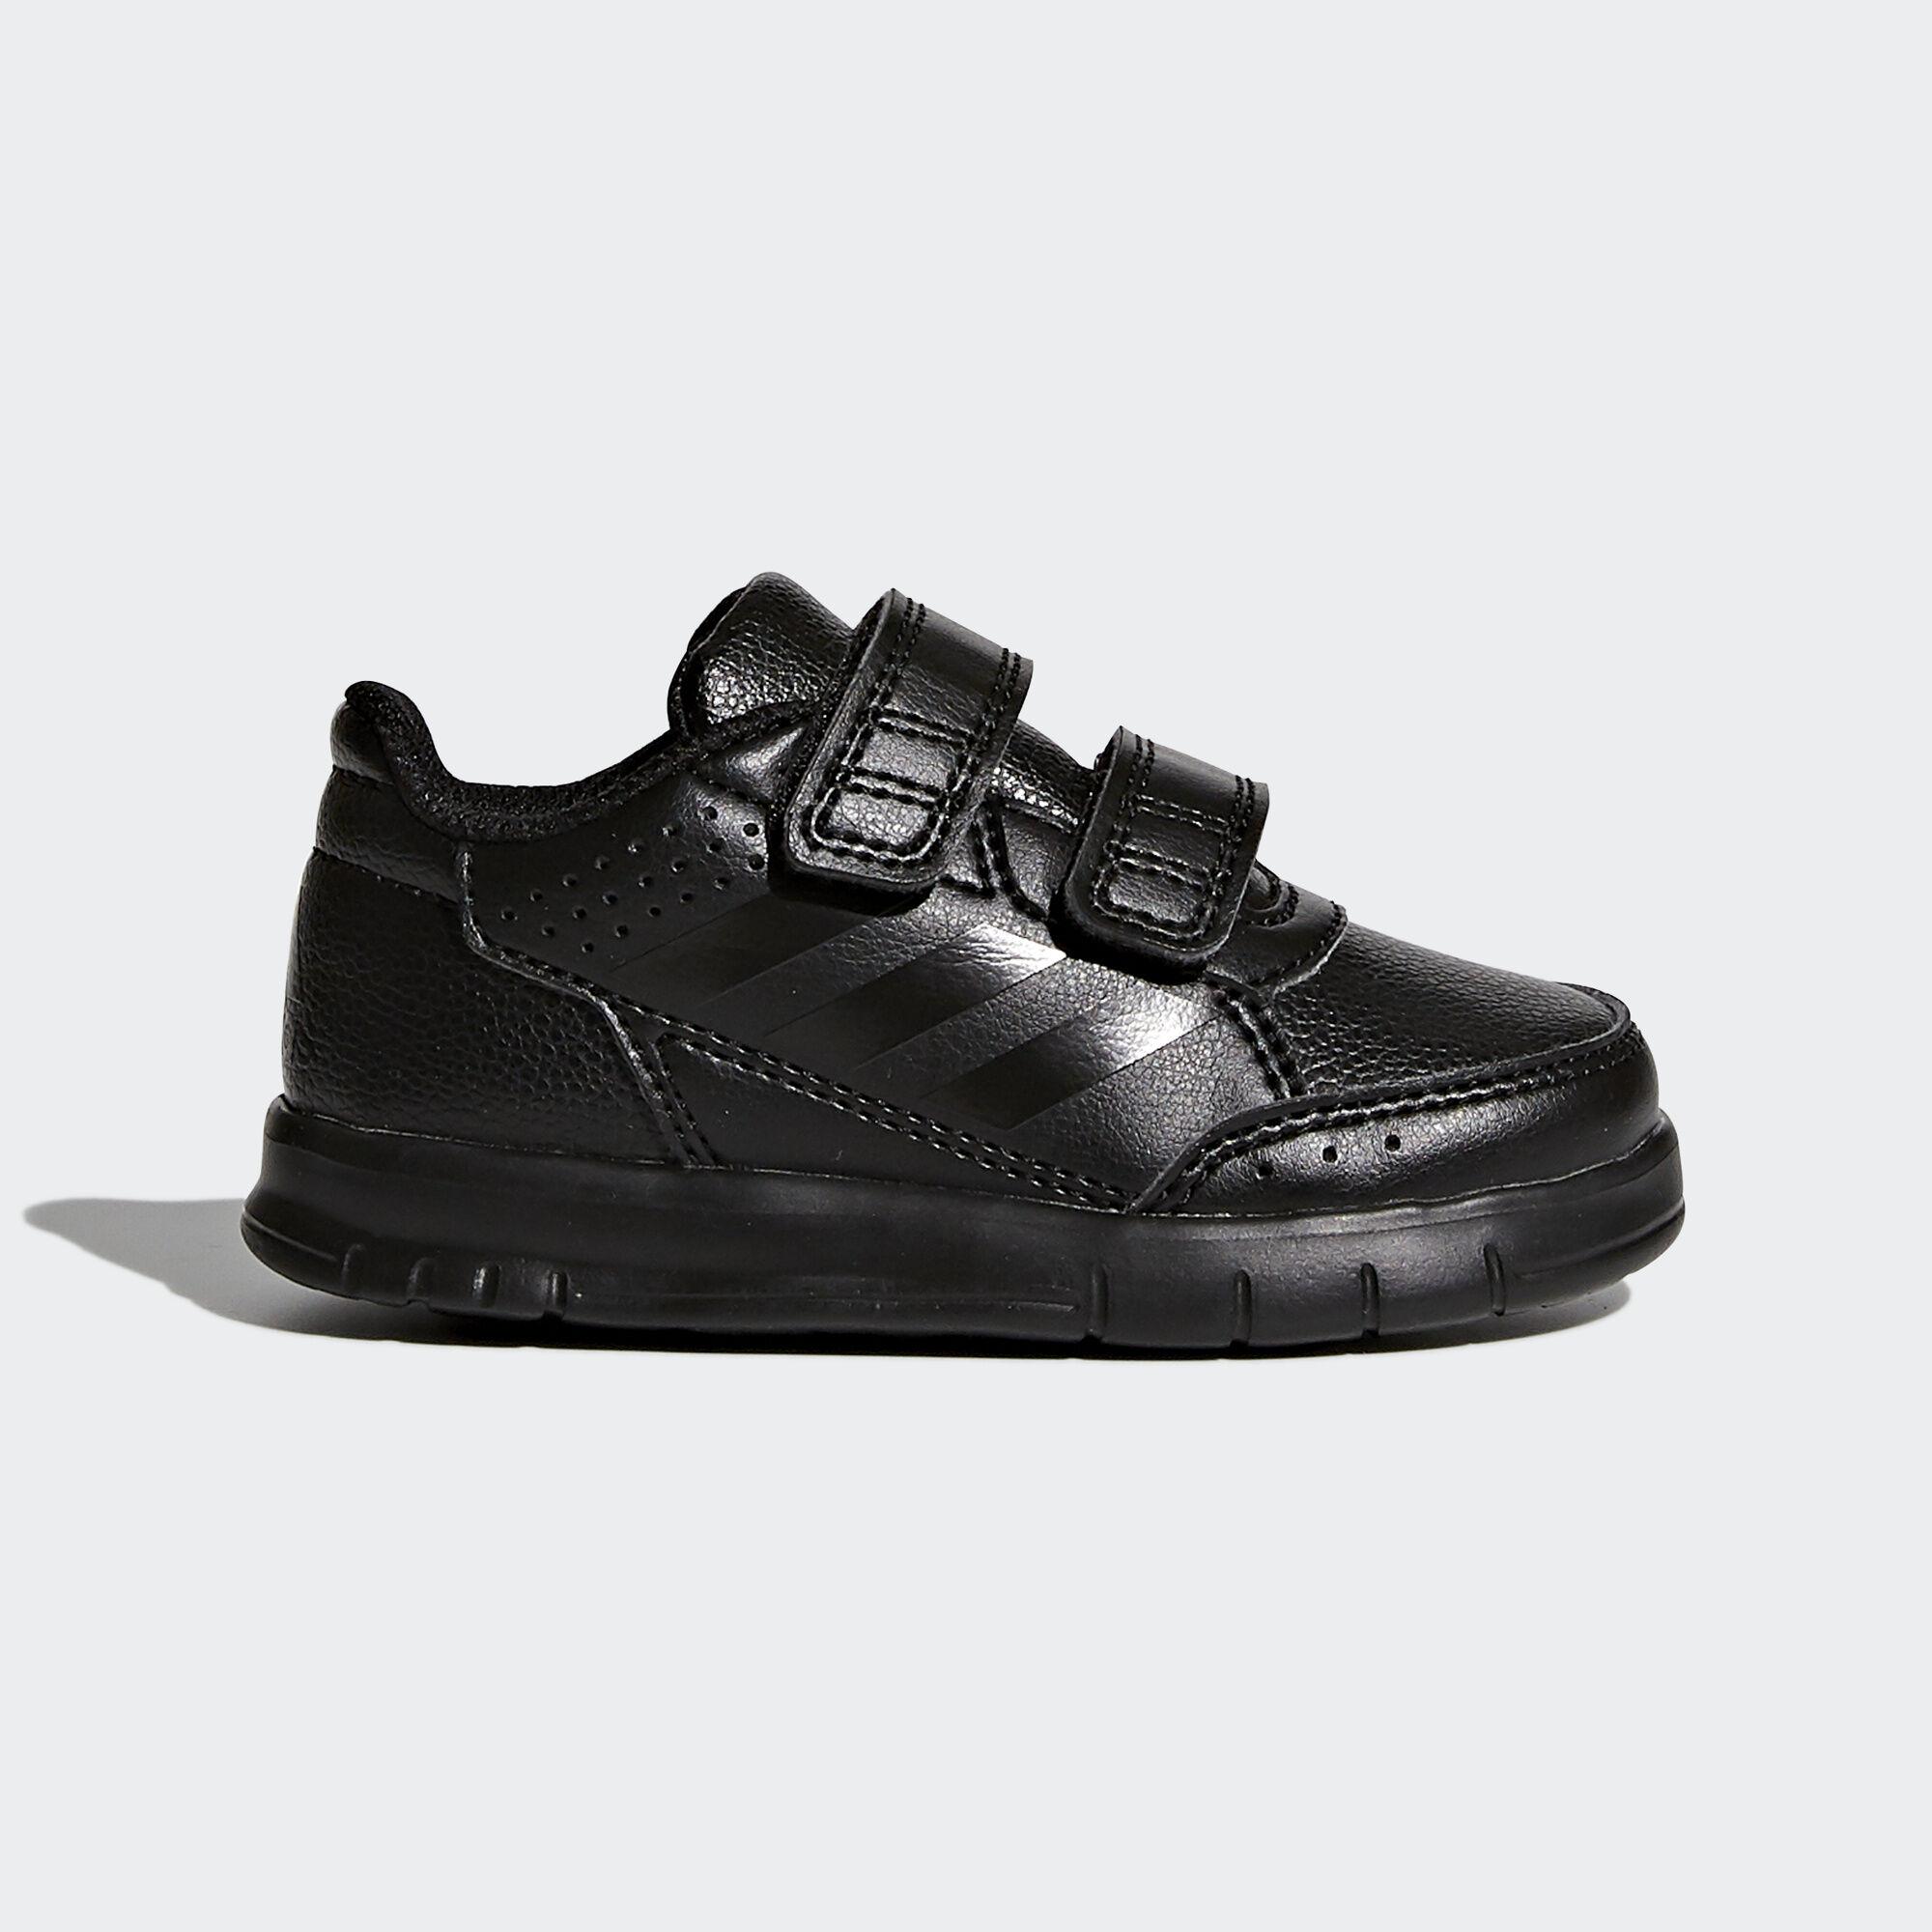 Adidas Superstar High Top Black